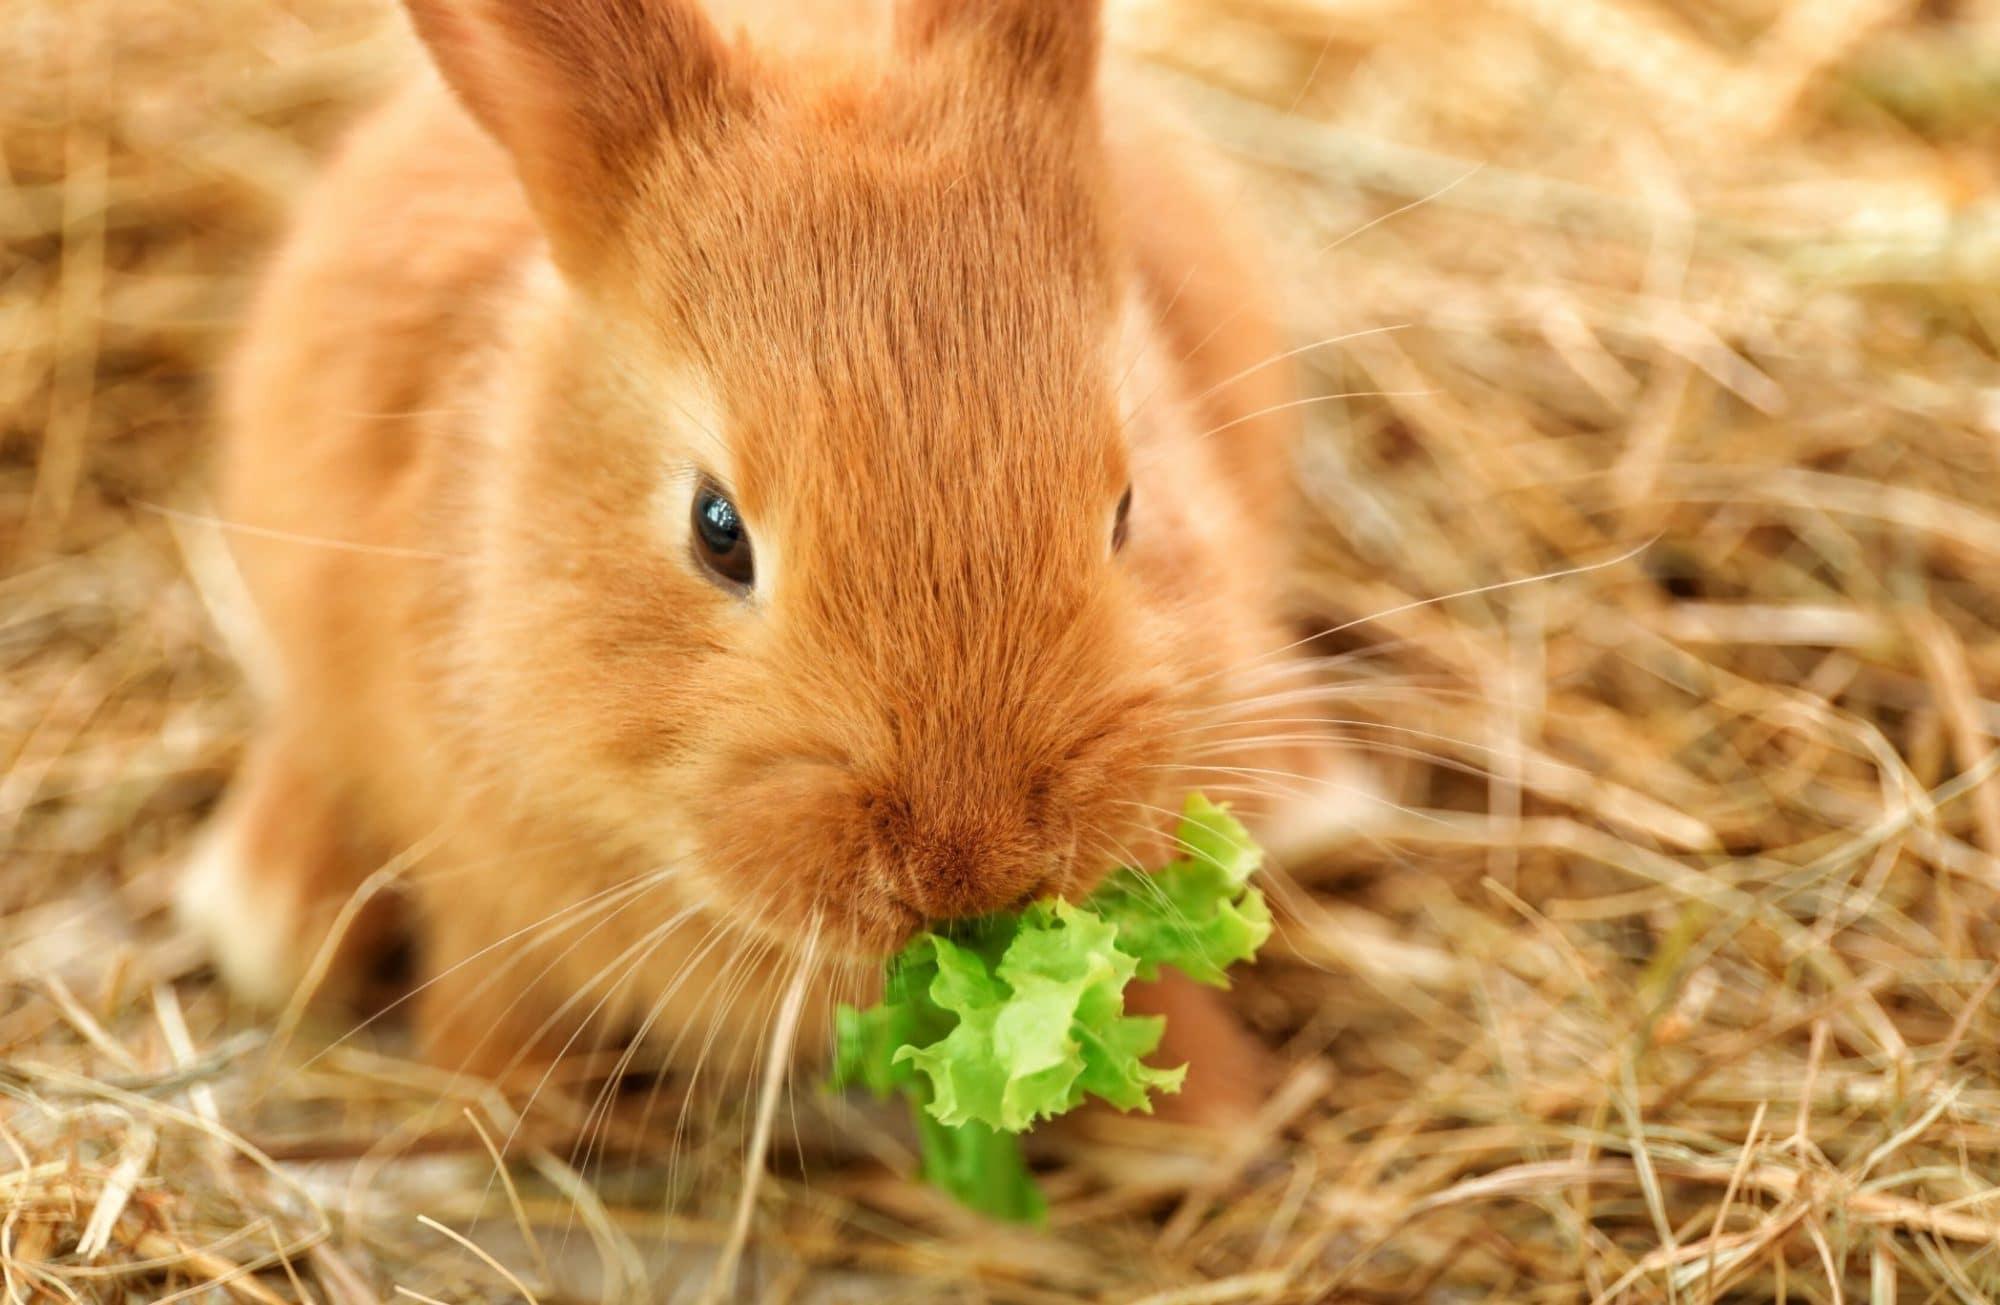 Les 8 légumes de printemps que votre lapin va adorer